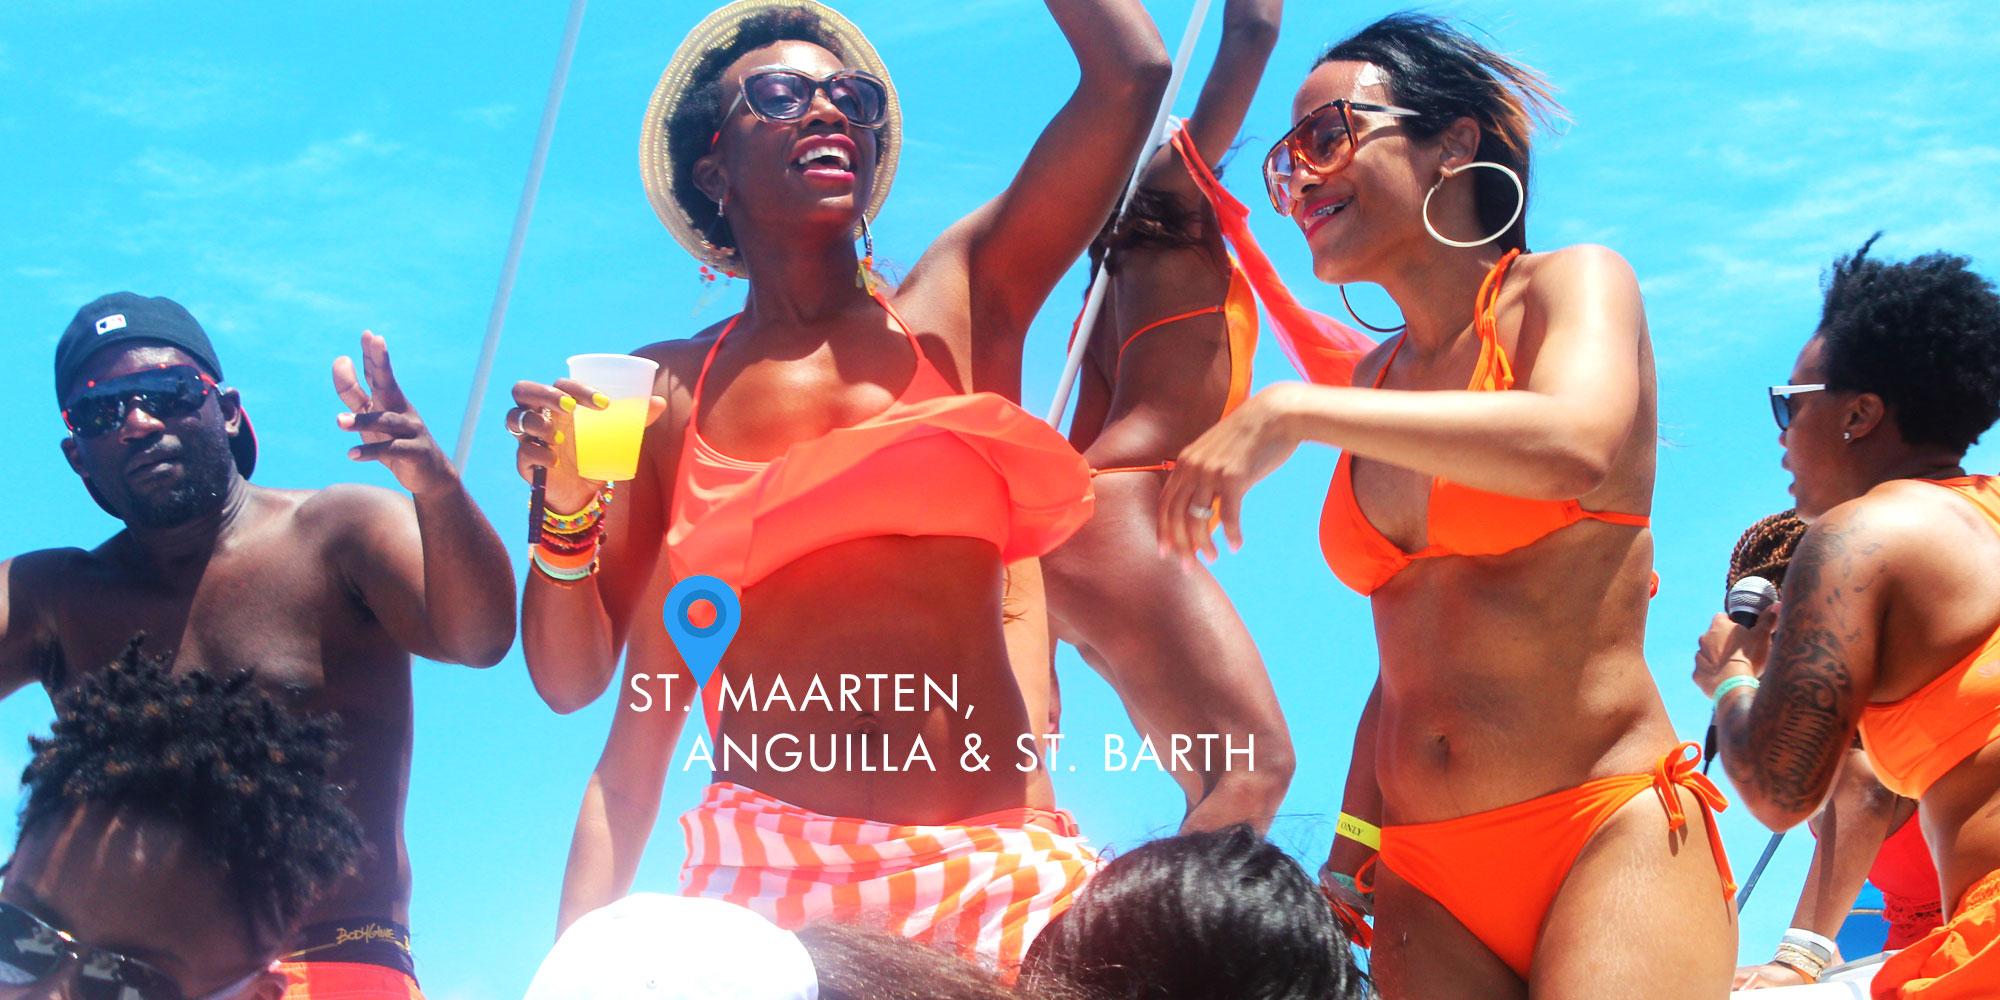 Omar-StMaarten-Anguilla-StBarth